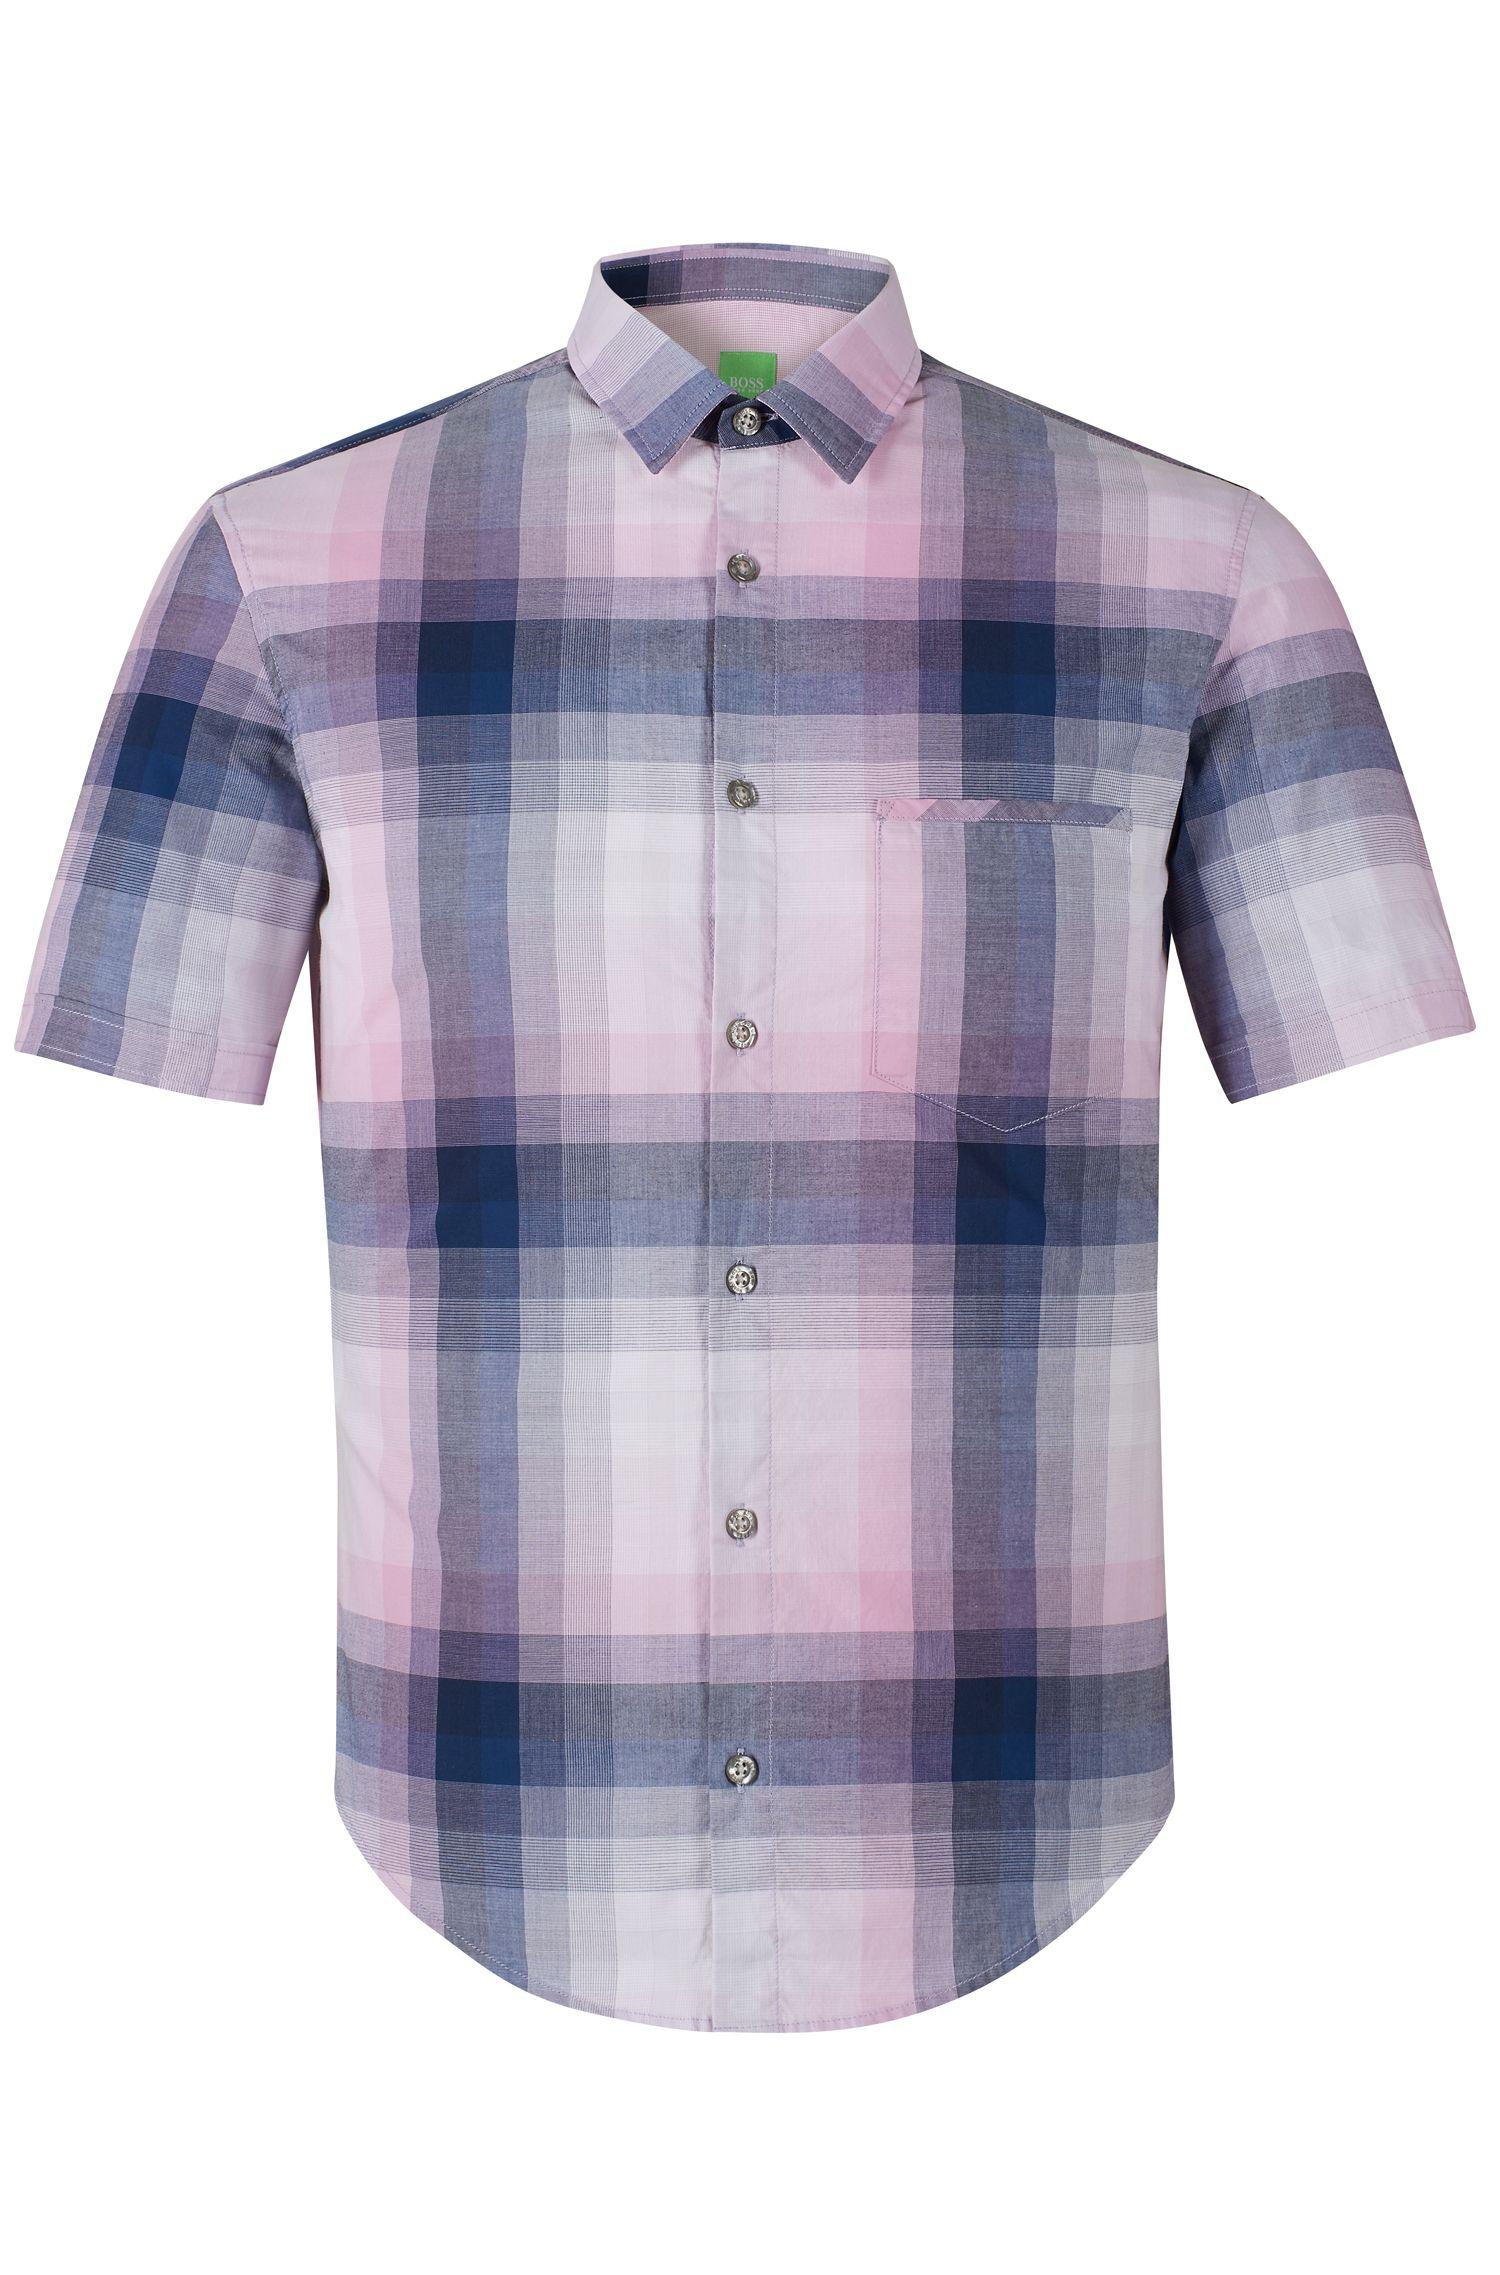 Gradient Checked Cotton Shirt, Regular Fit | C-Bansino, Open Purple